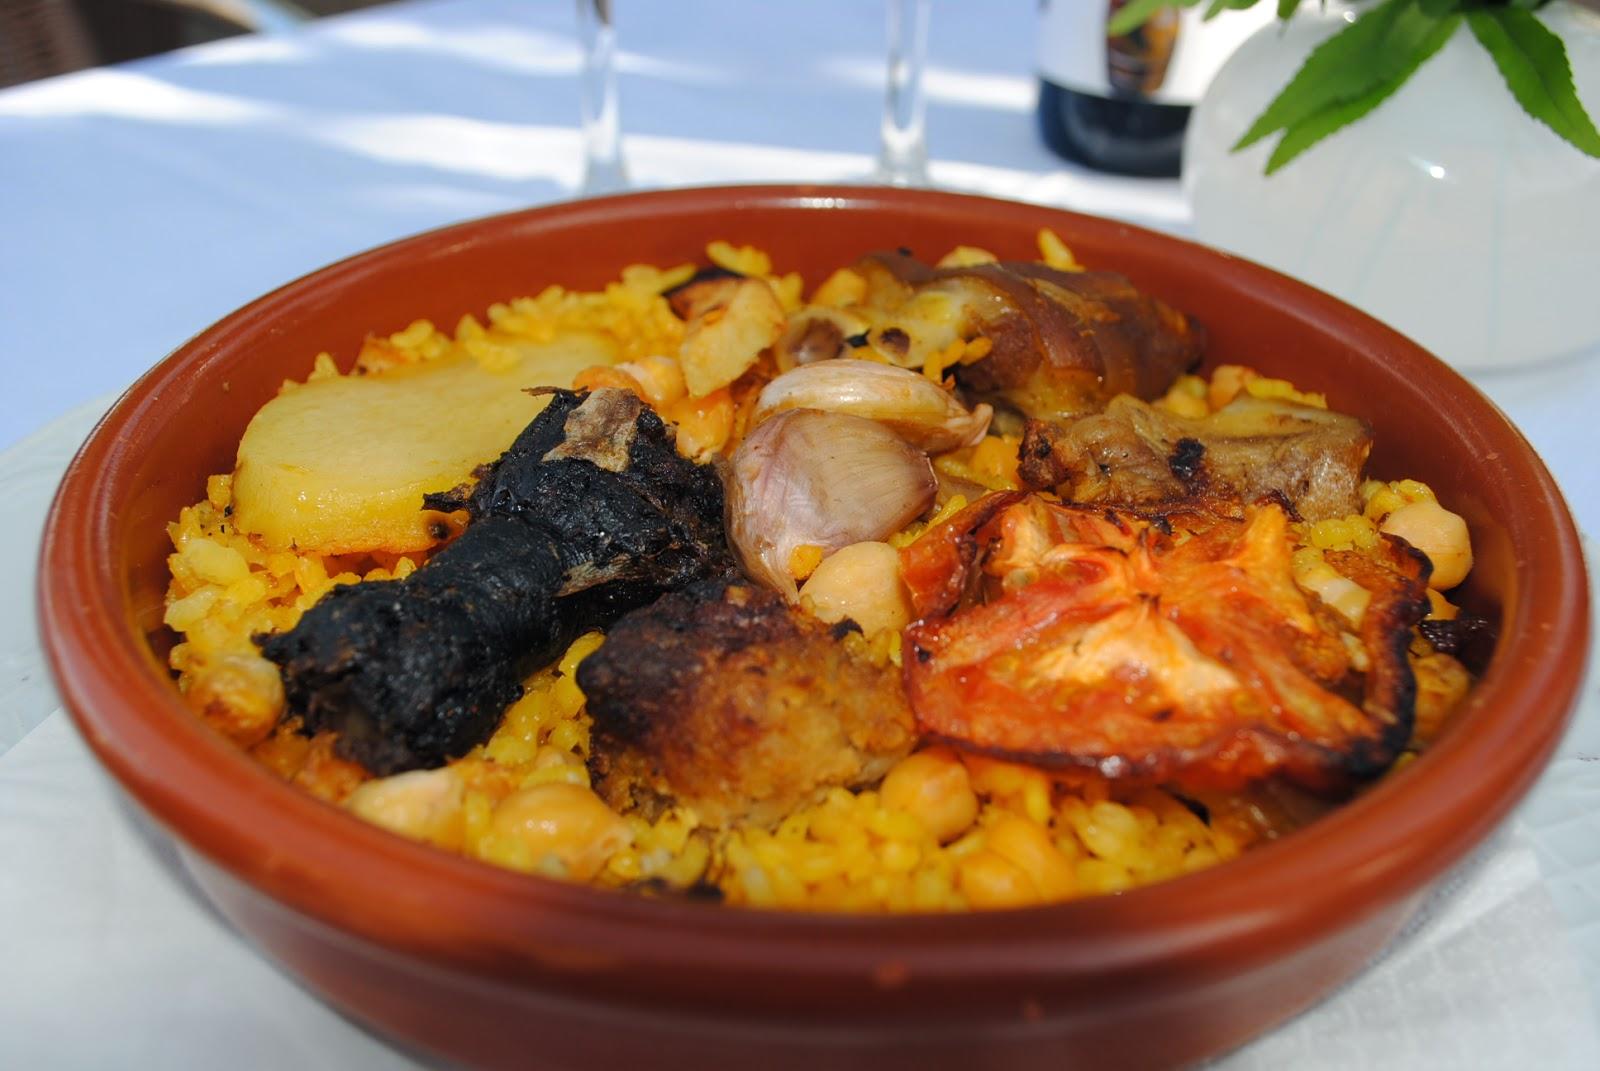 arroz al horno xativa